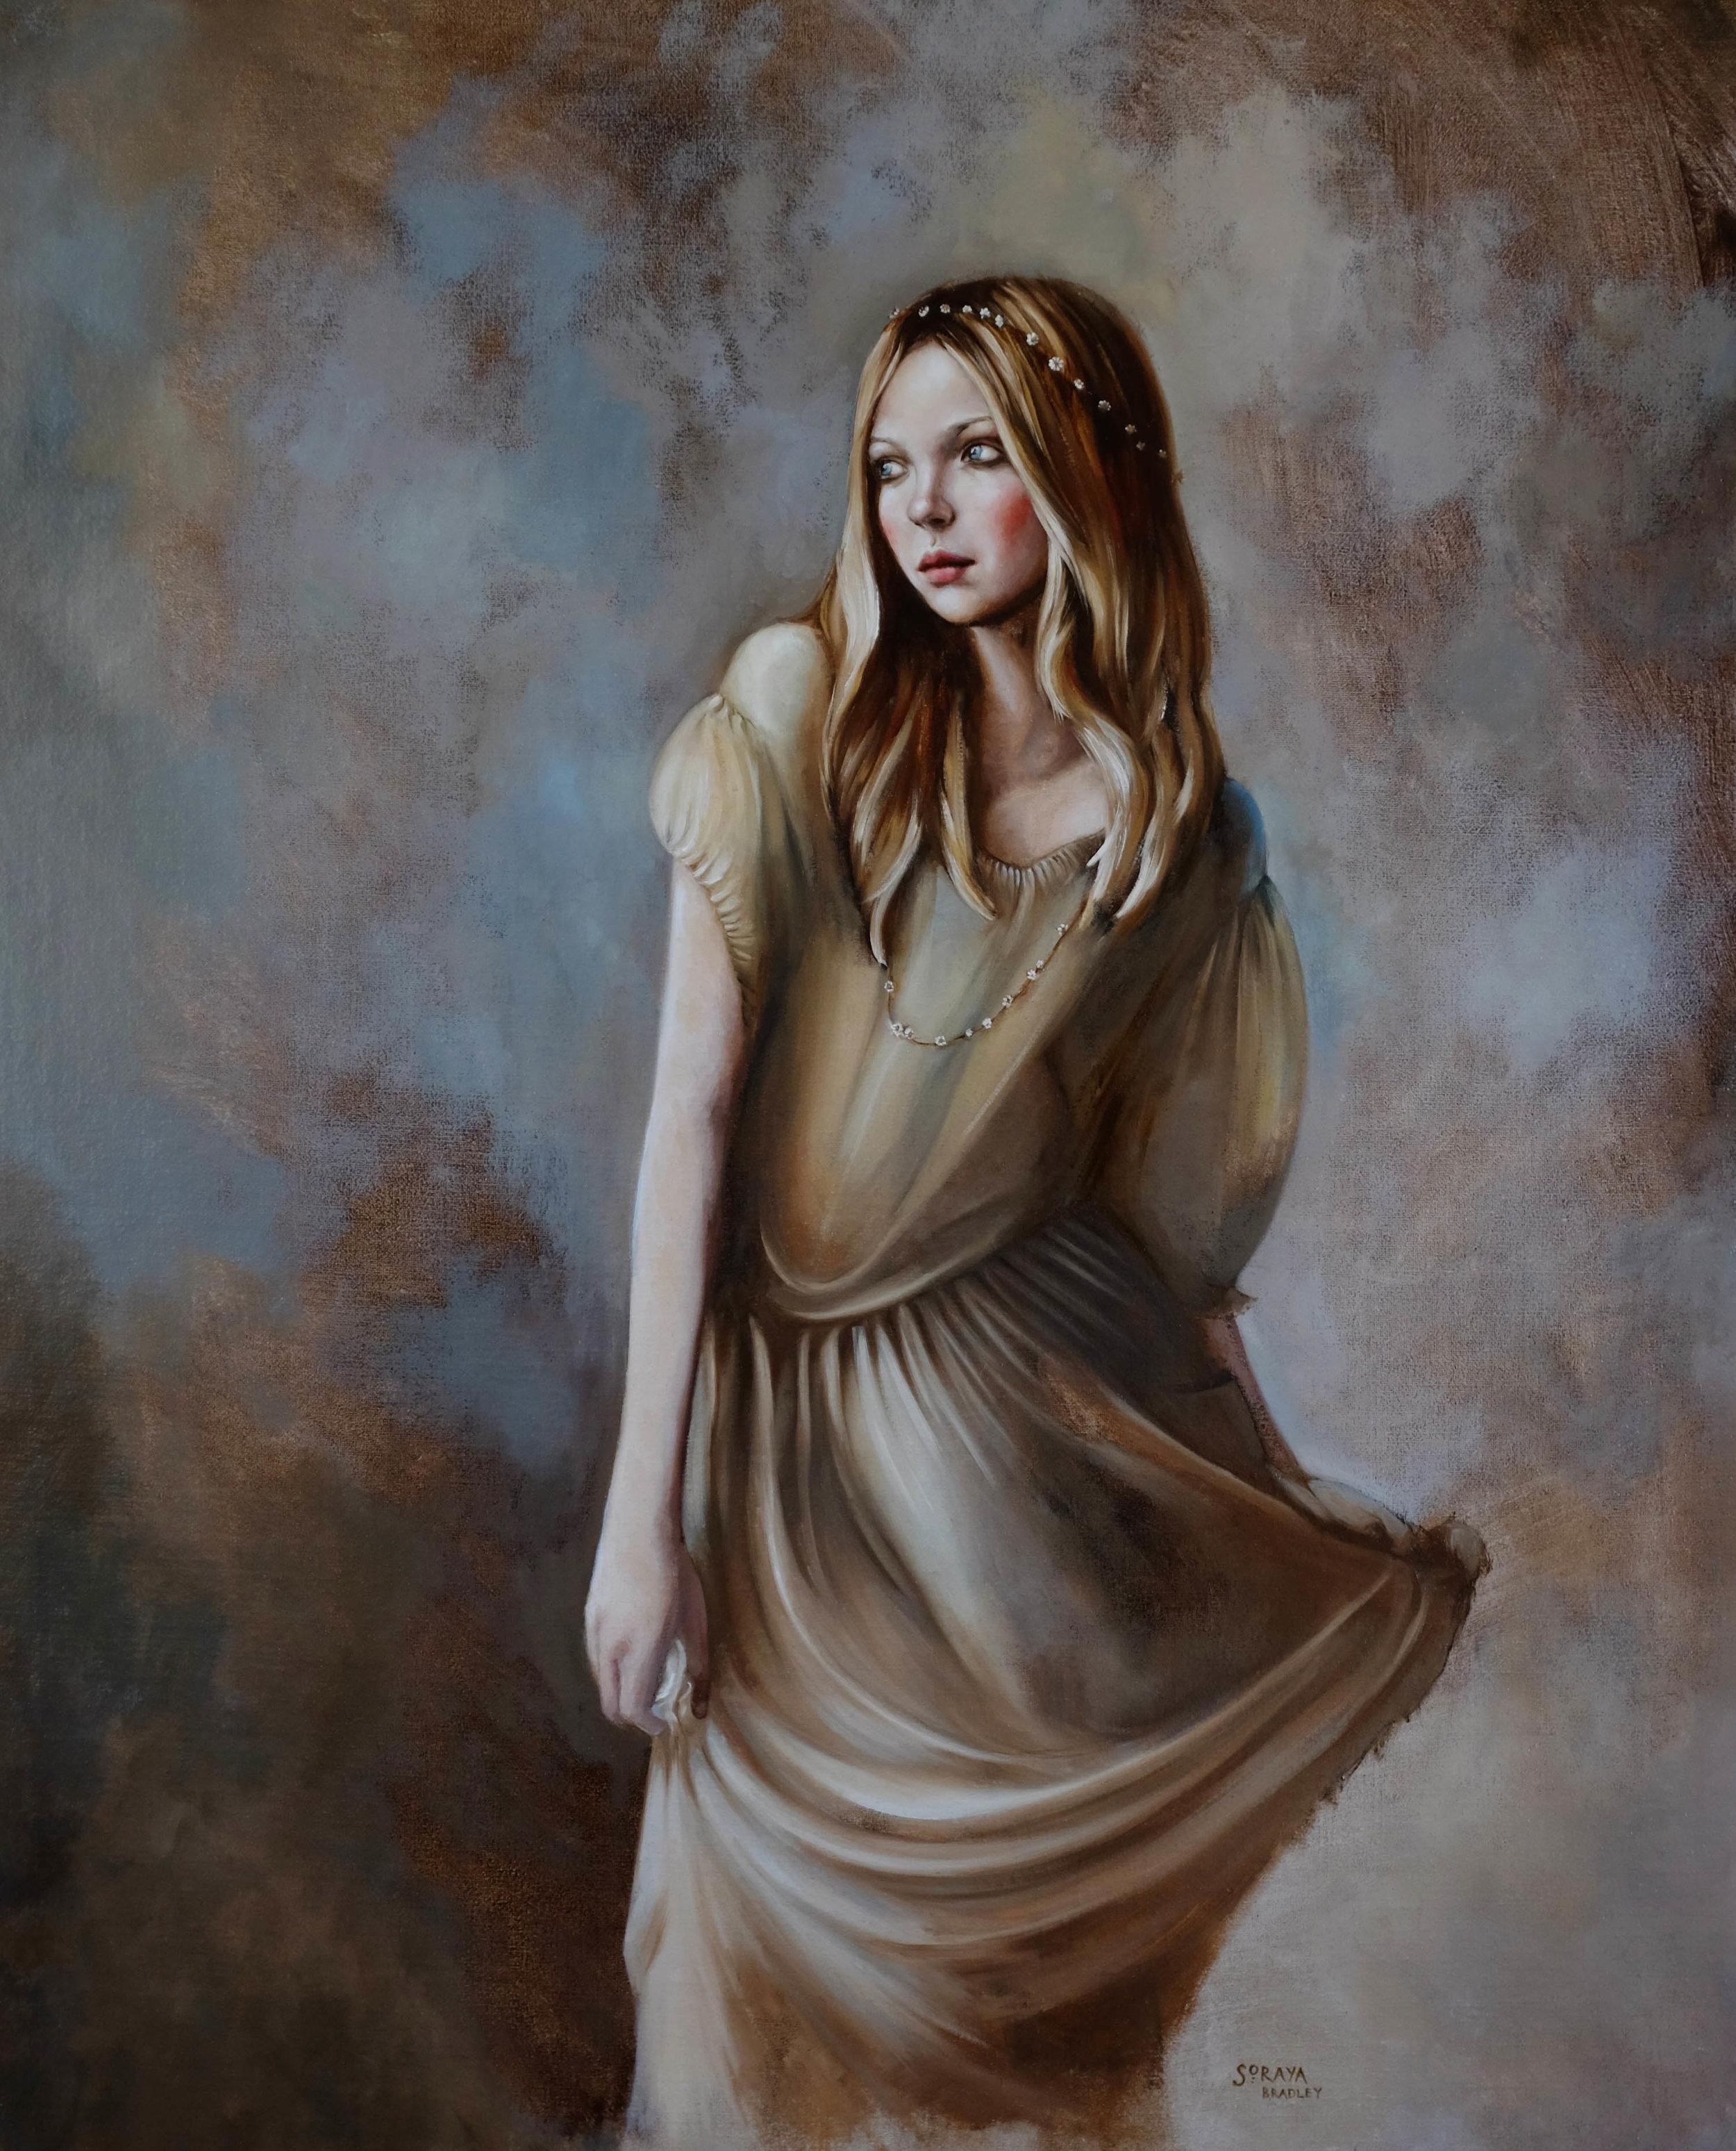 Daisy Chains by Soraya Bradley